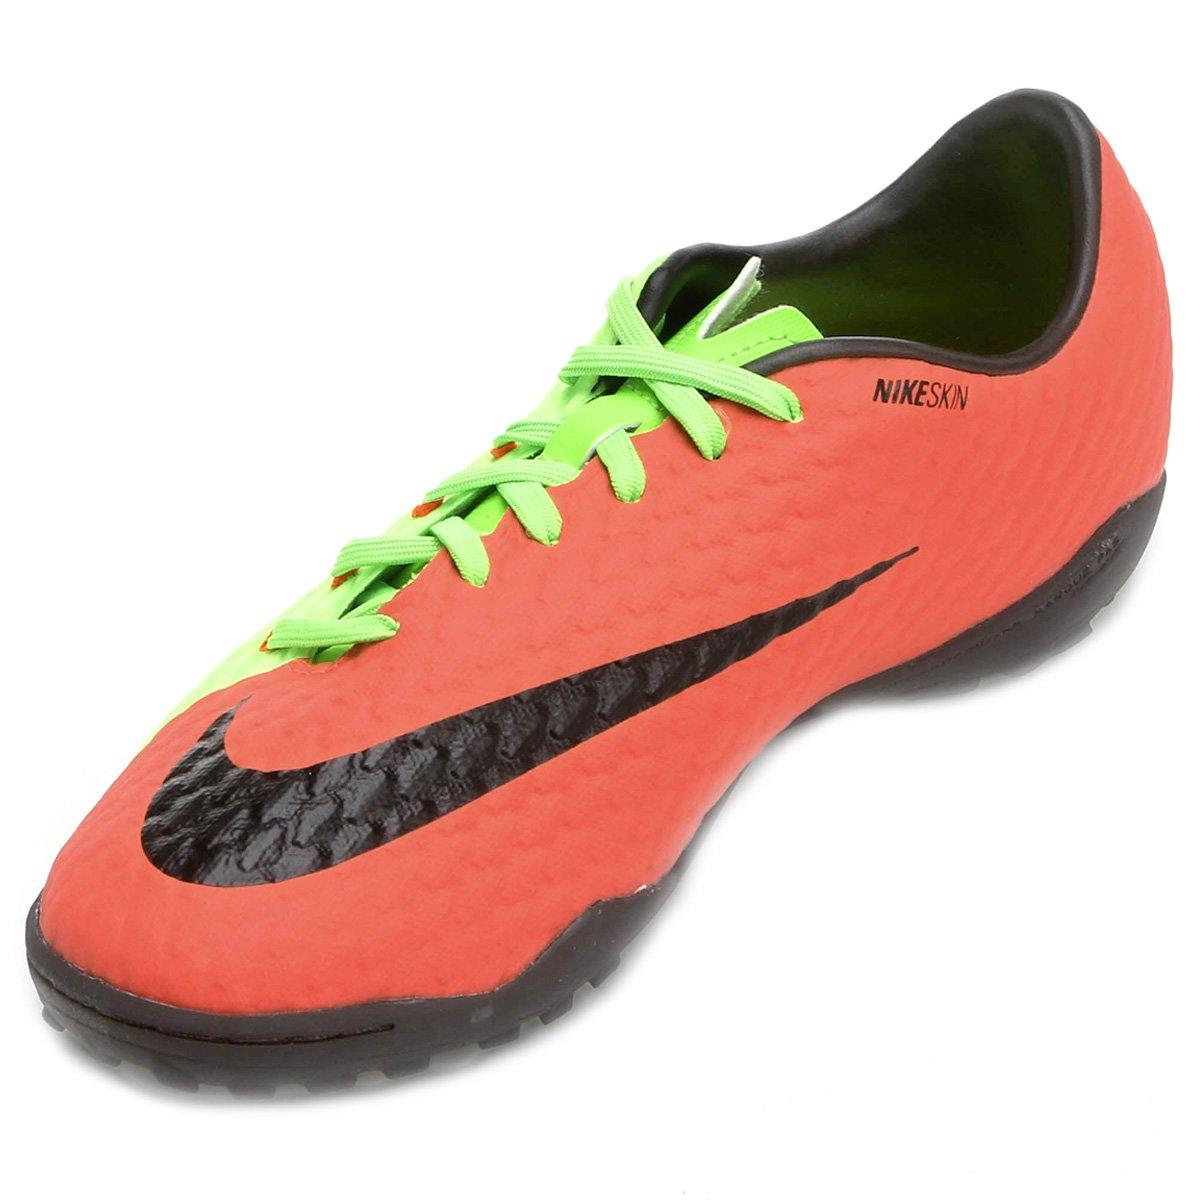 588edaa9cb Chuteira Society Nike Hypervenom Phelon 3 TF - Laranja e Verde ...